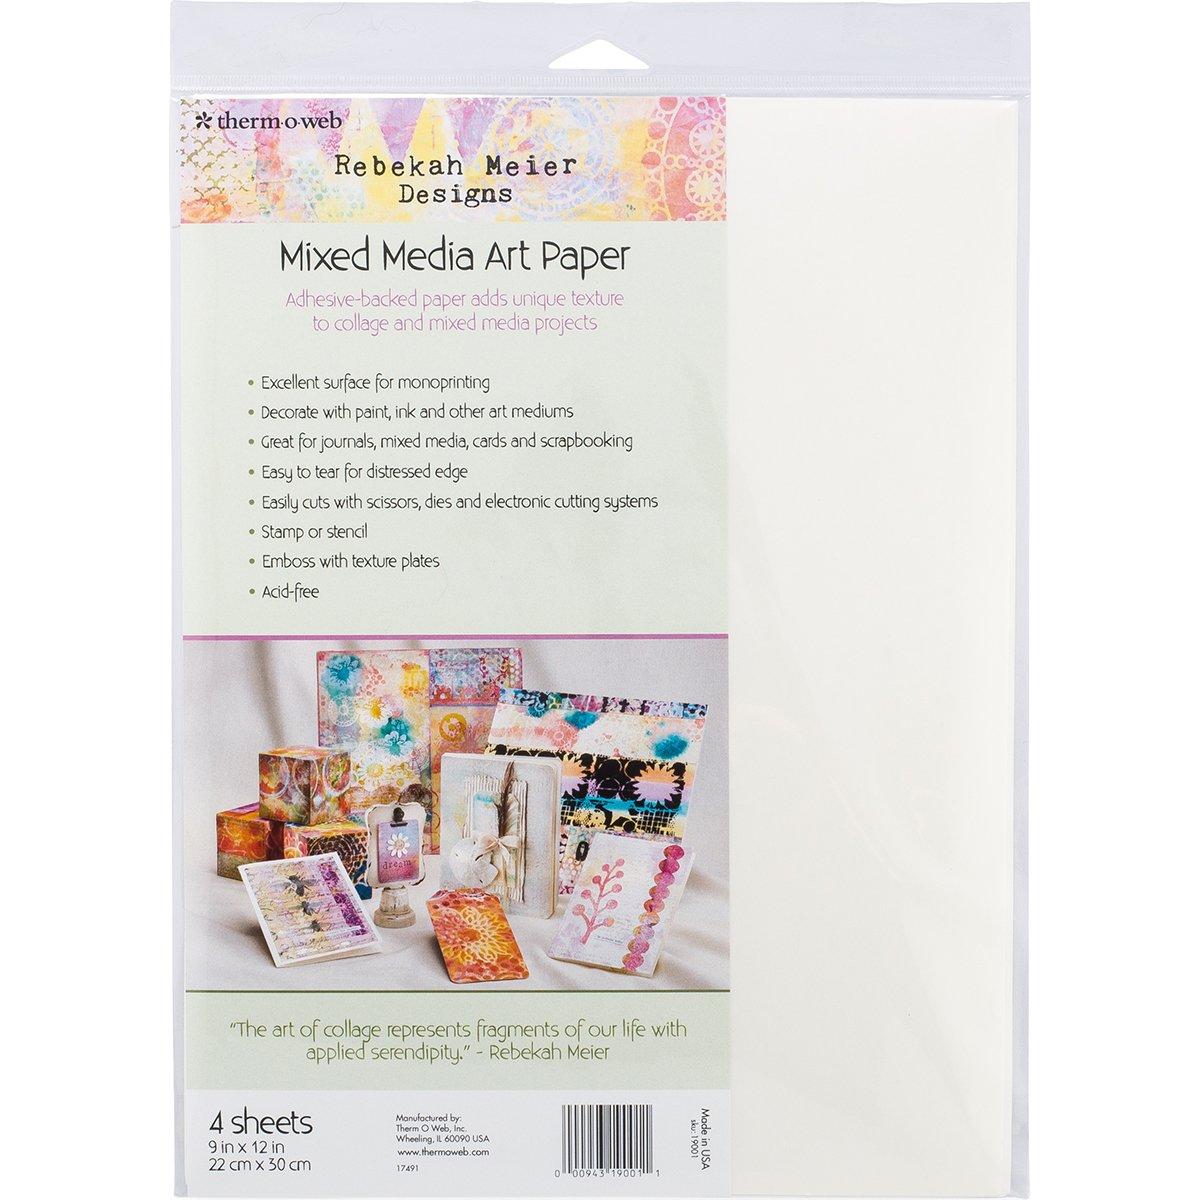 Rebekah Meier Designs Mixed Media Art Paper 9'' x 12'' (4 sheets per pack) by Rebekah Meier Designs for Therm O Web